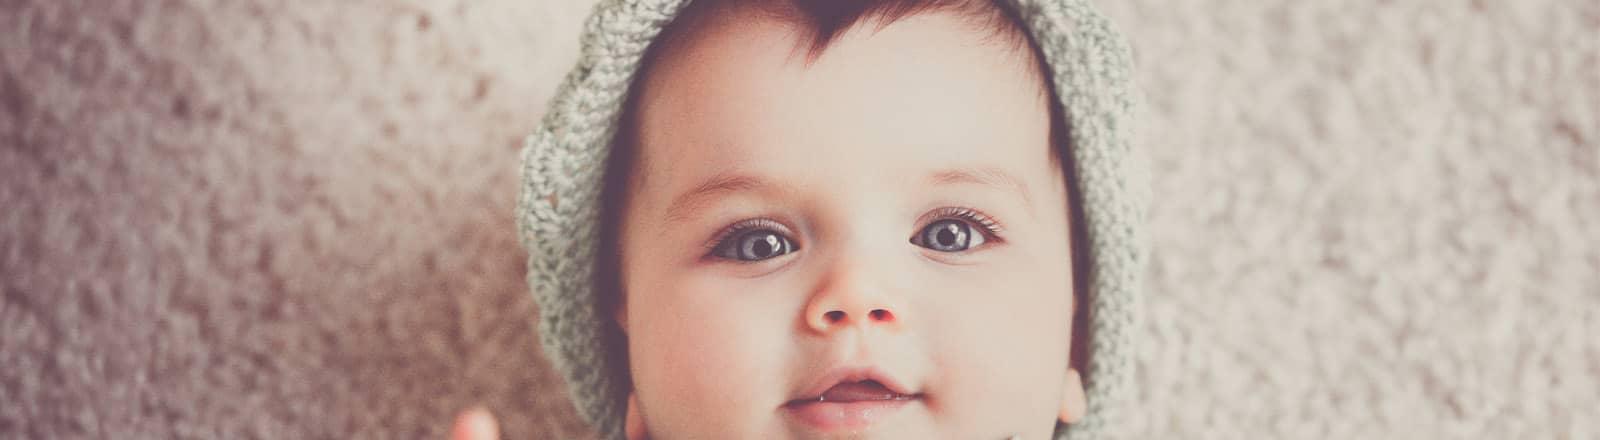 valoracion inicial fisioterapia del bebe